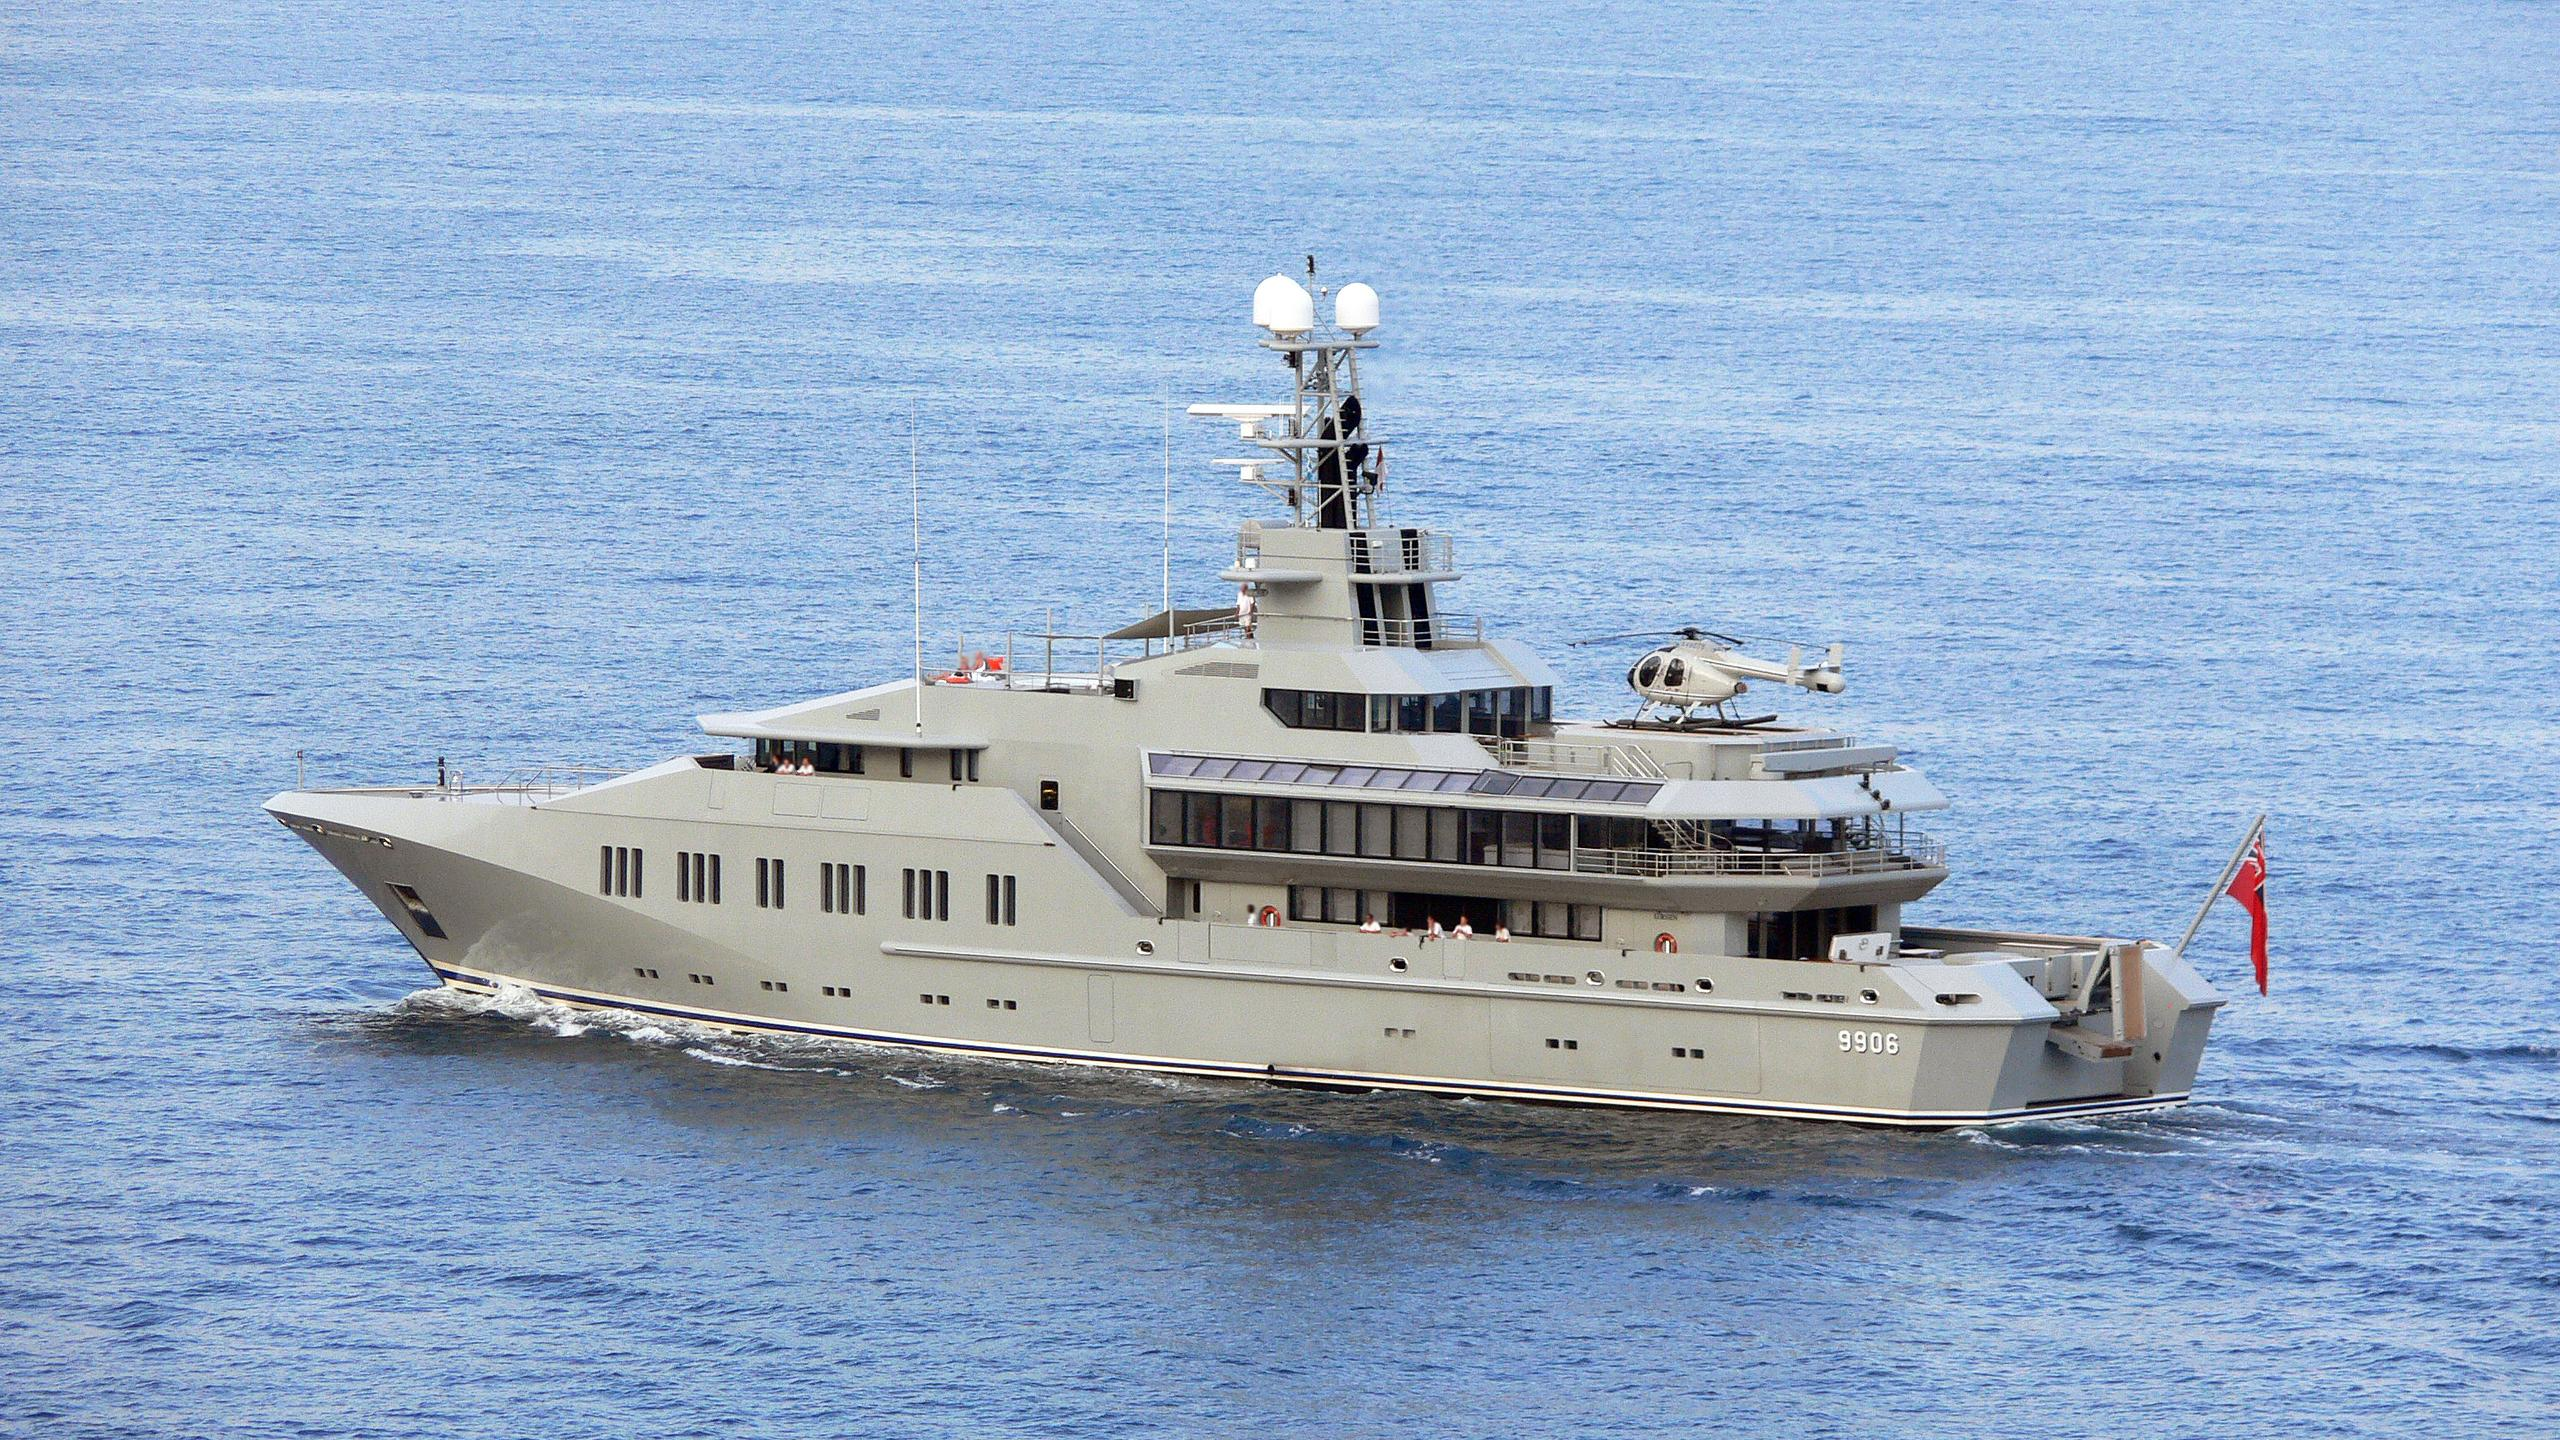 skat-explorer-yacht-lurssen-2002-71m-half-profile